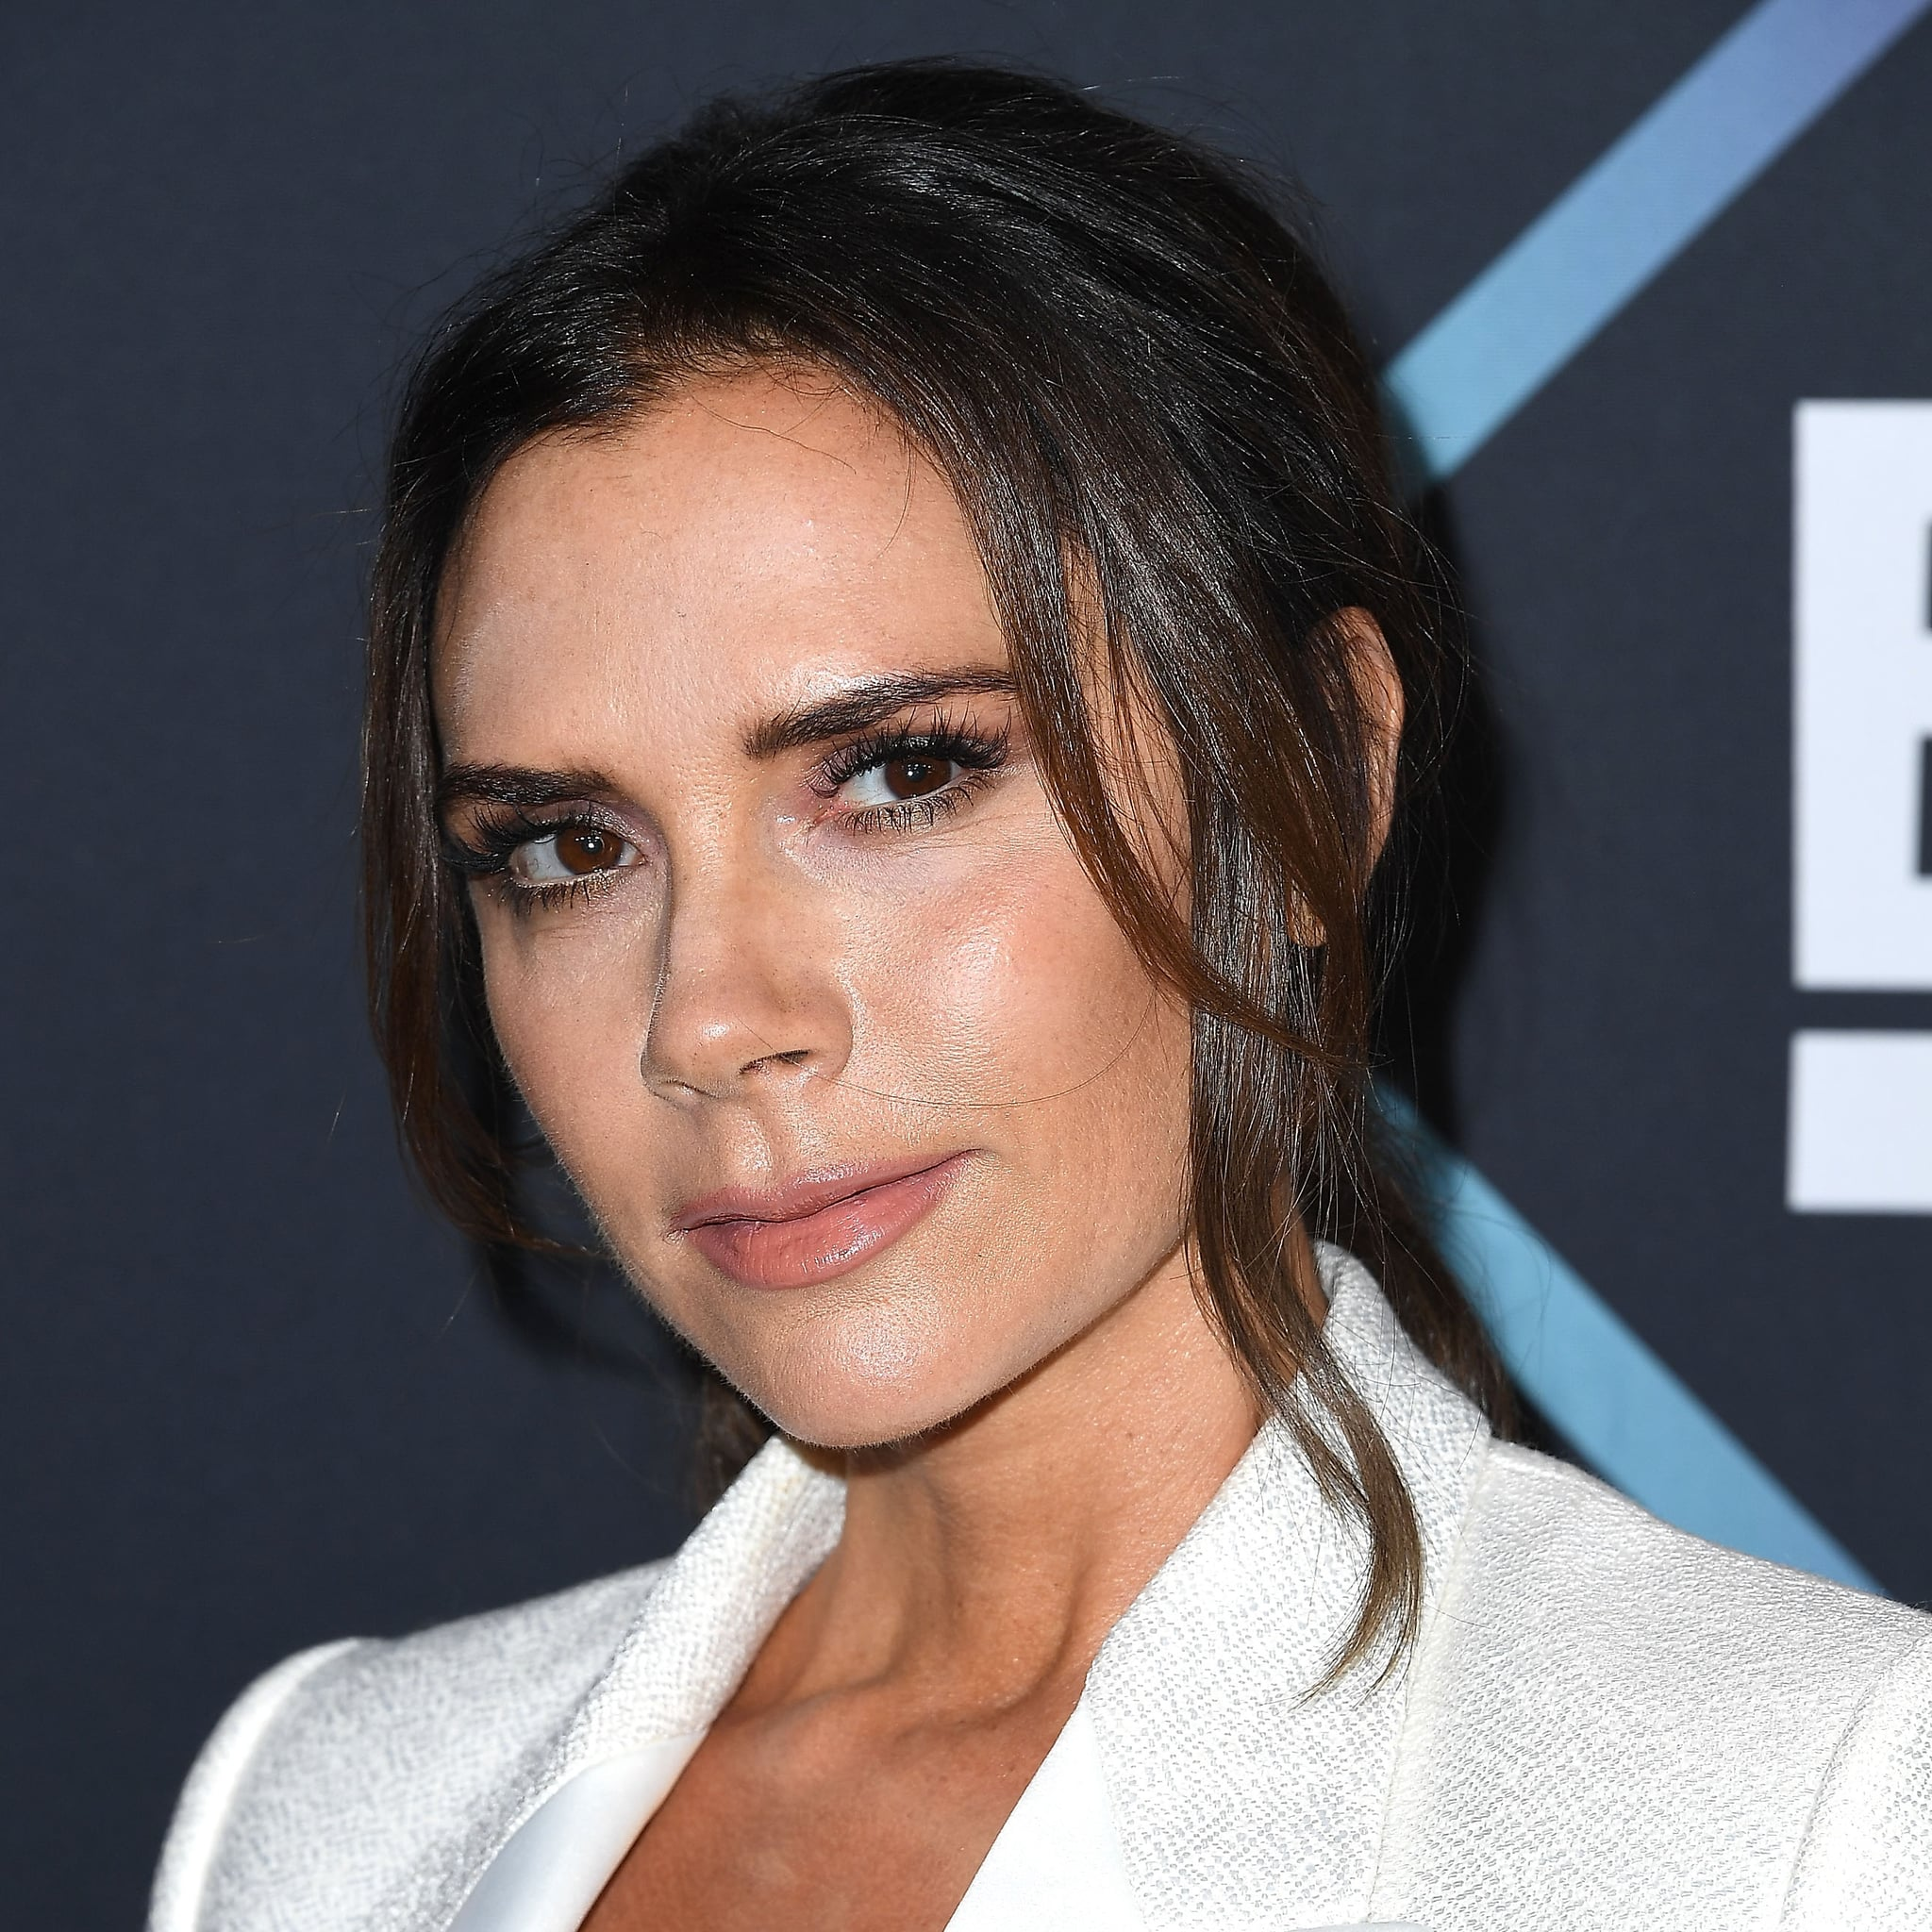 Victoria Beckham Popsugar Celebrity